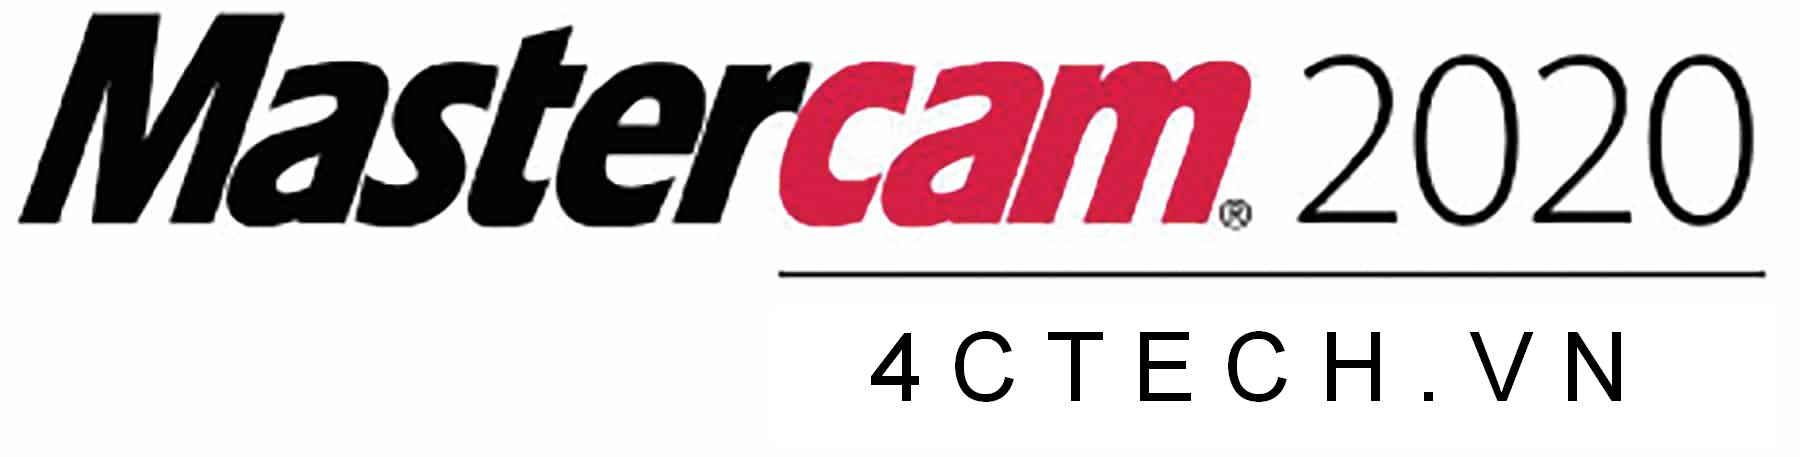 Mastercam 2020 4ctech